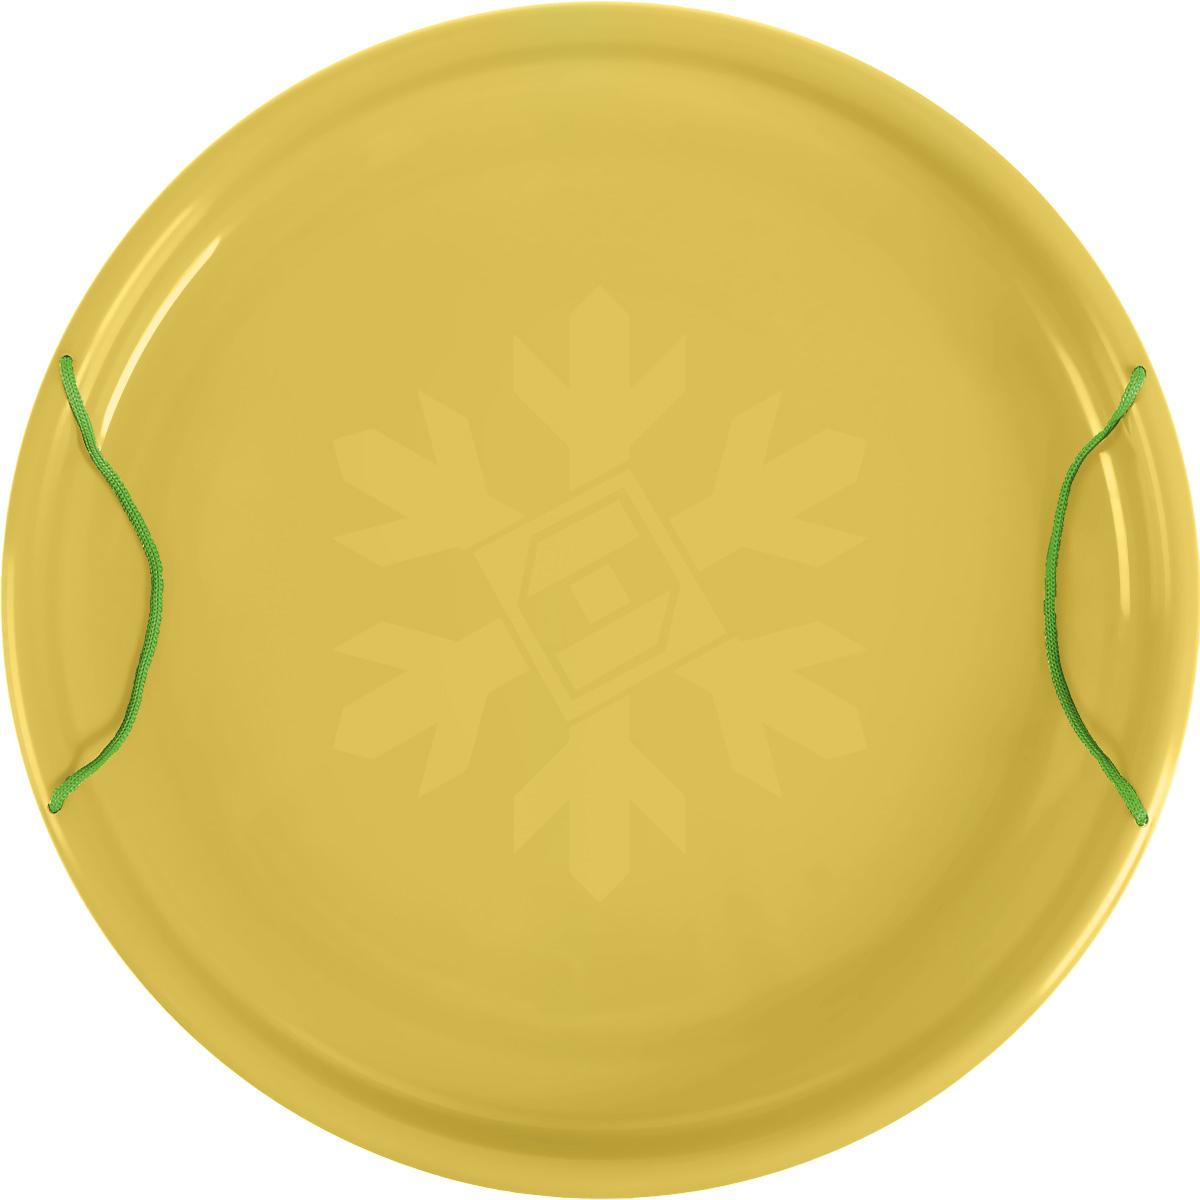 "Фото Санки-ледянки Престиж ""Экстрим"", цвет: желтый, диаметр 53 см"